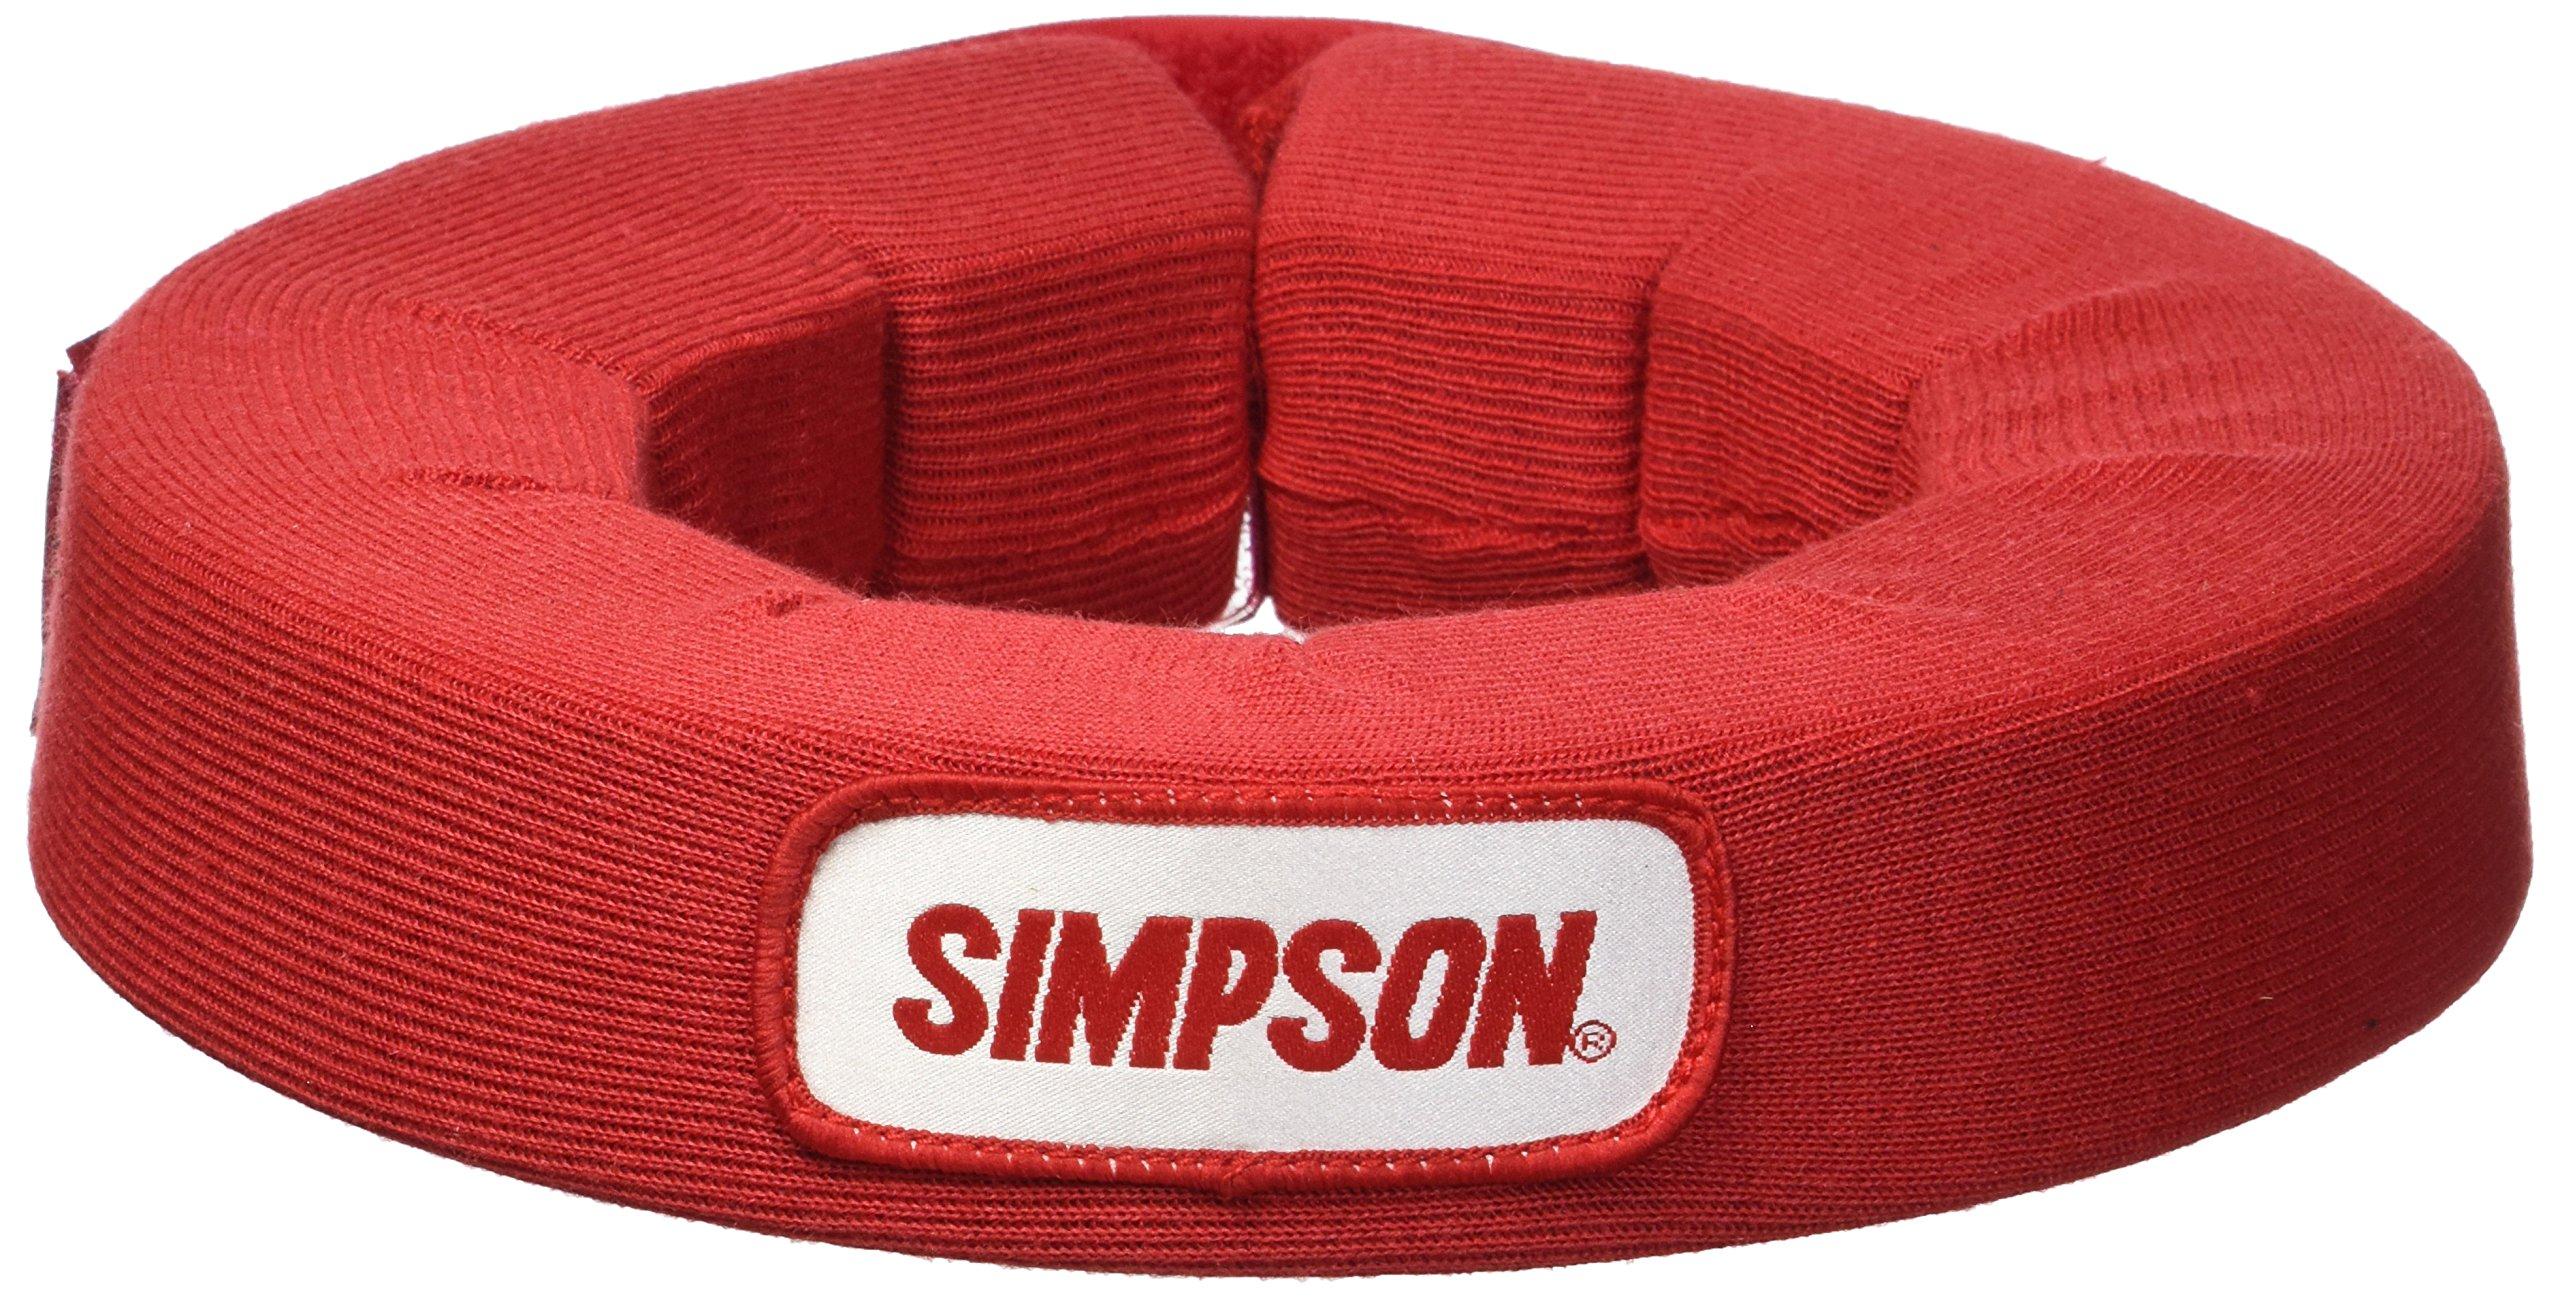 Simpson 23022R Neck Brace